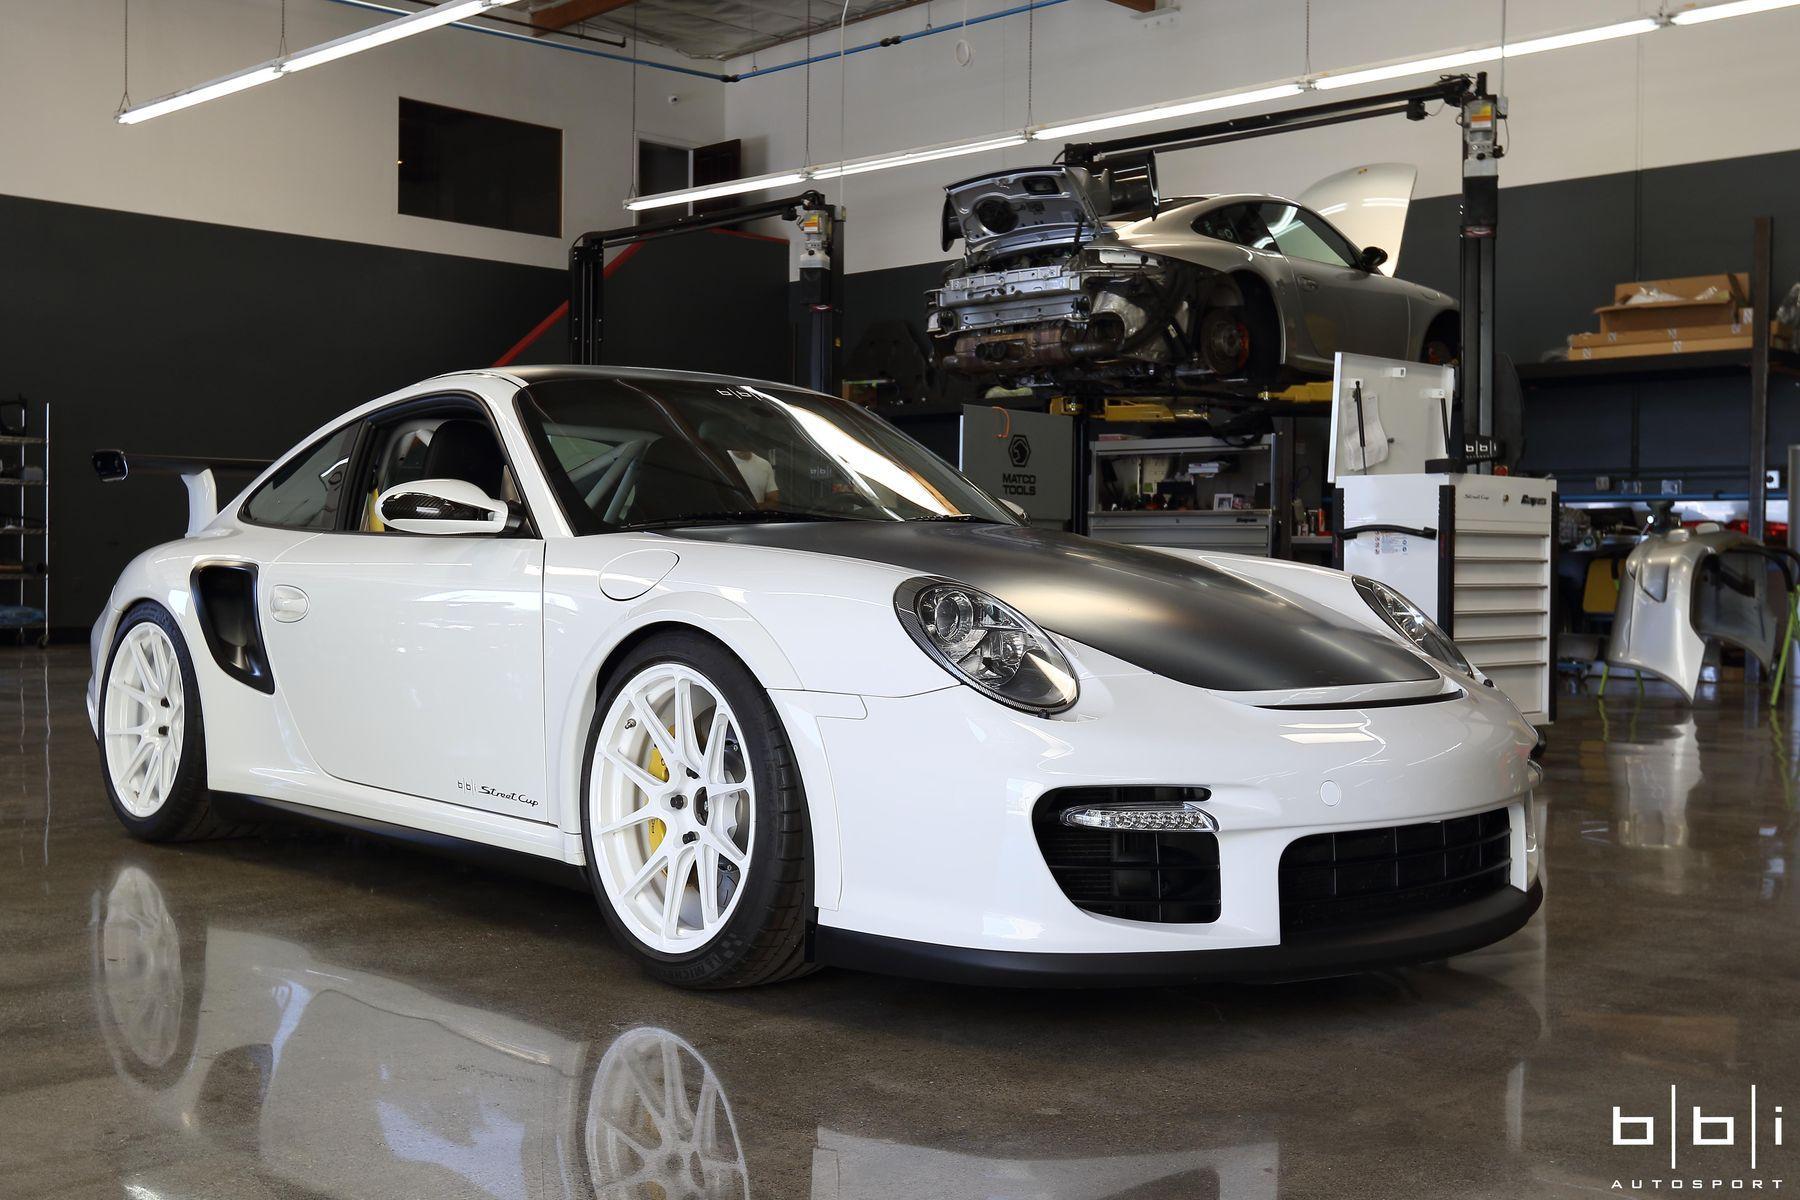 2016 Porsche 911 | BBi Autosport's Project Swan Porsche 911 Turbo Wins TUNED Tuner Car Shootout on Forgeline One Piece Forged Monoblock GA1R Open Lug Wheels